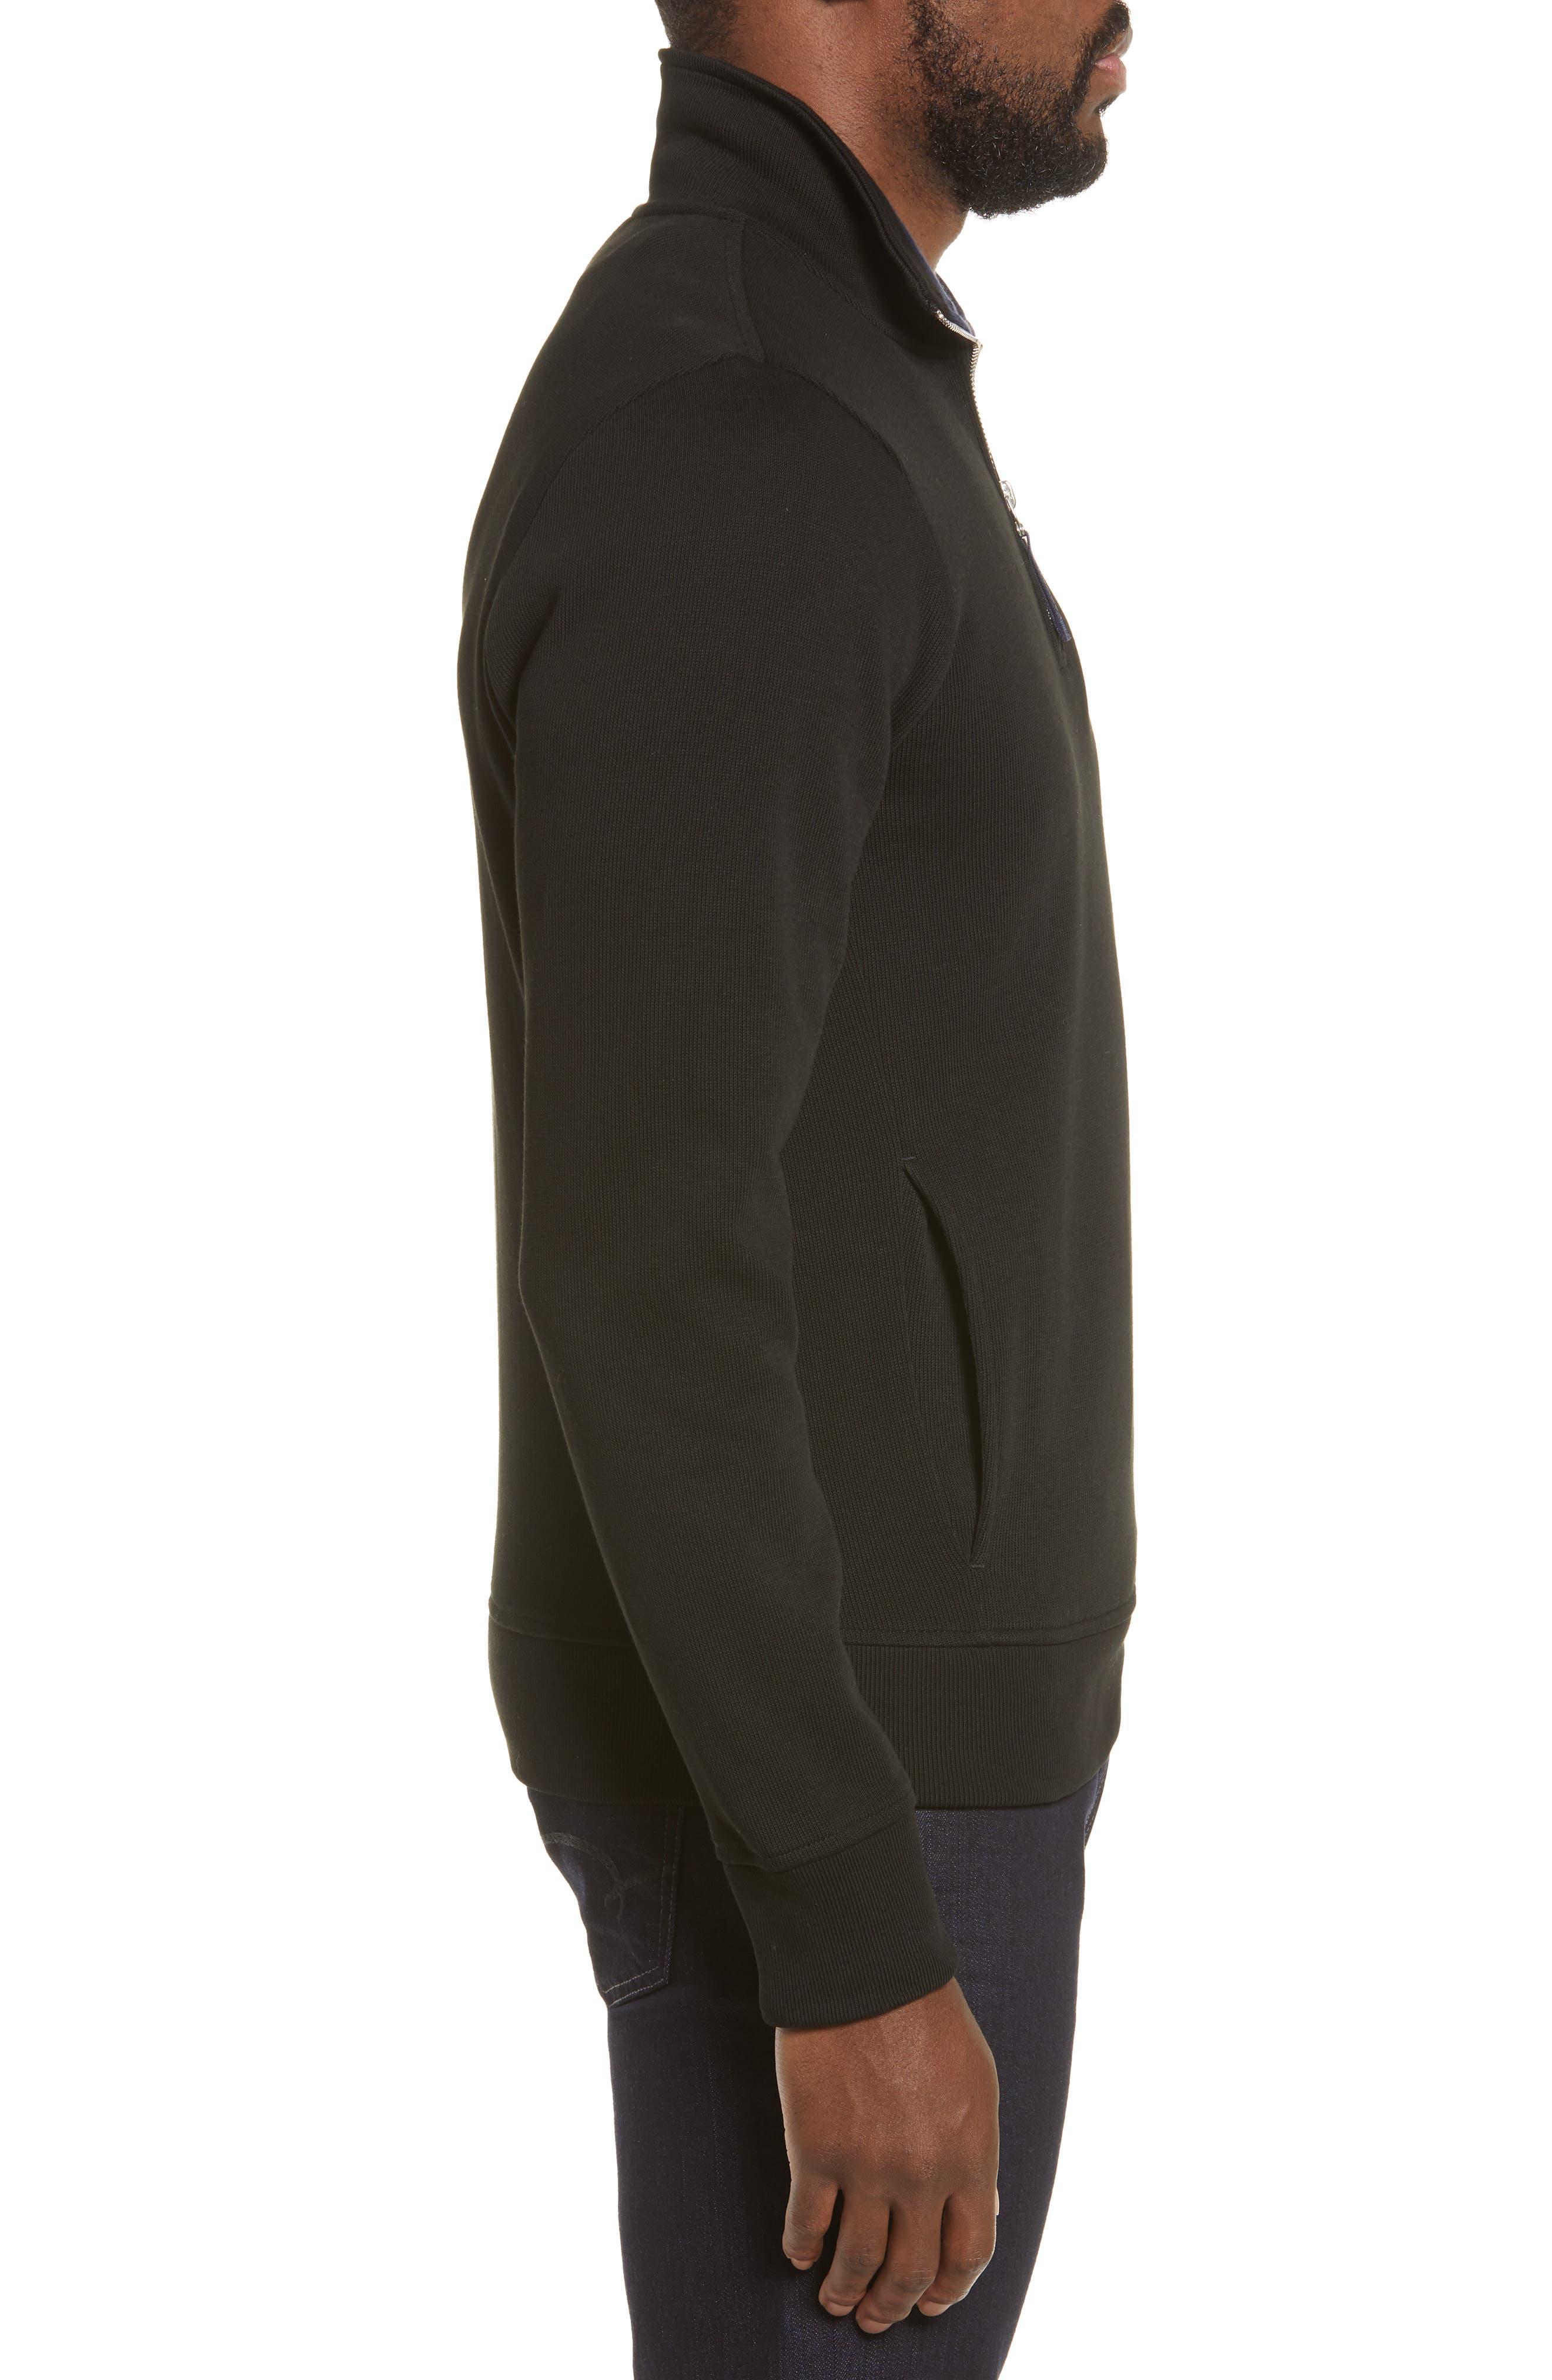 LACOSTE,                             Quarter Zip Pullover,                             Alternate thumbnail 3, color,                             BLACK/ NAVY BLUE